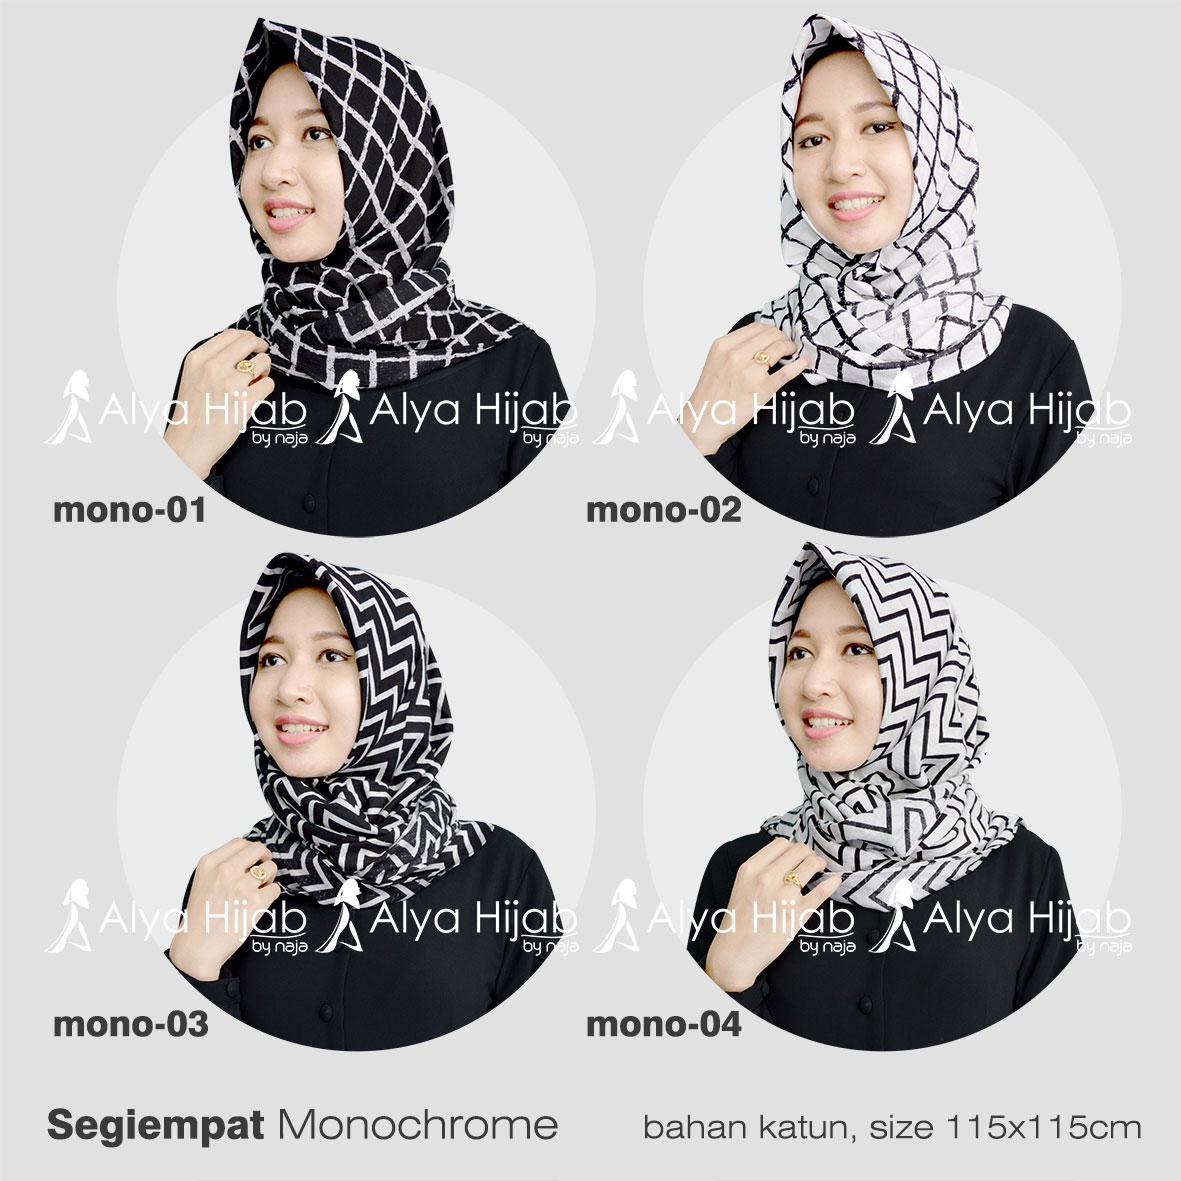 87 Gambar Lengkap Tutorial Hijab Segi Empat Bermotif Paling